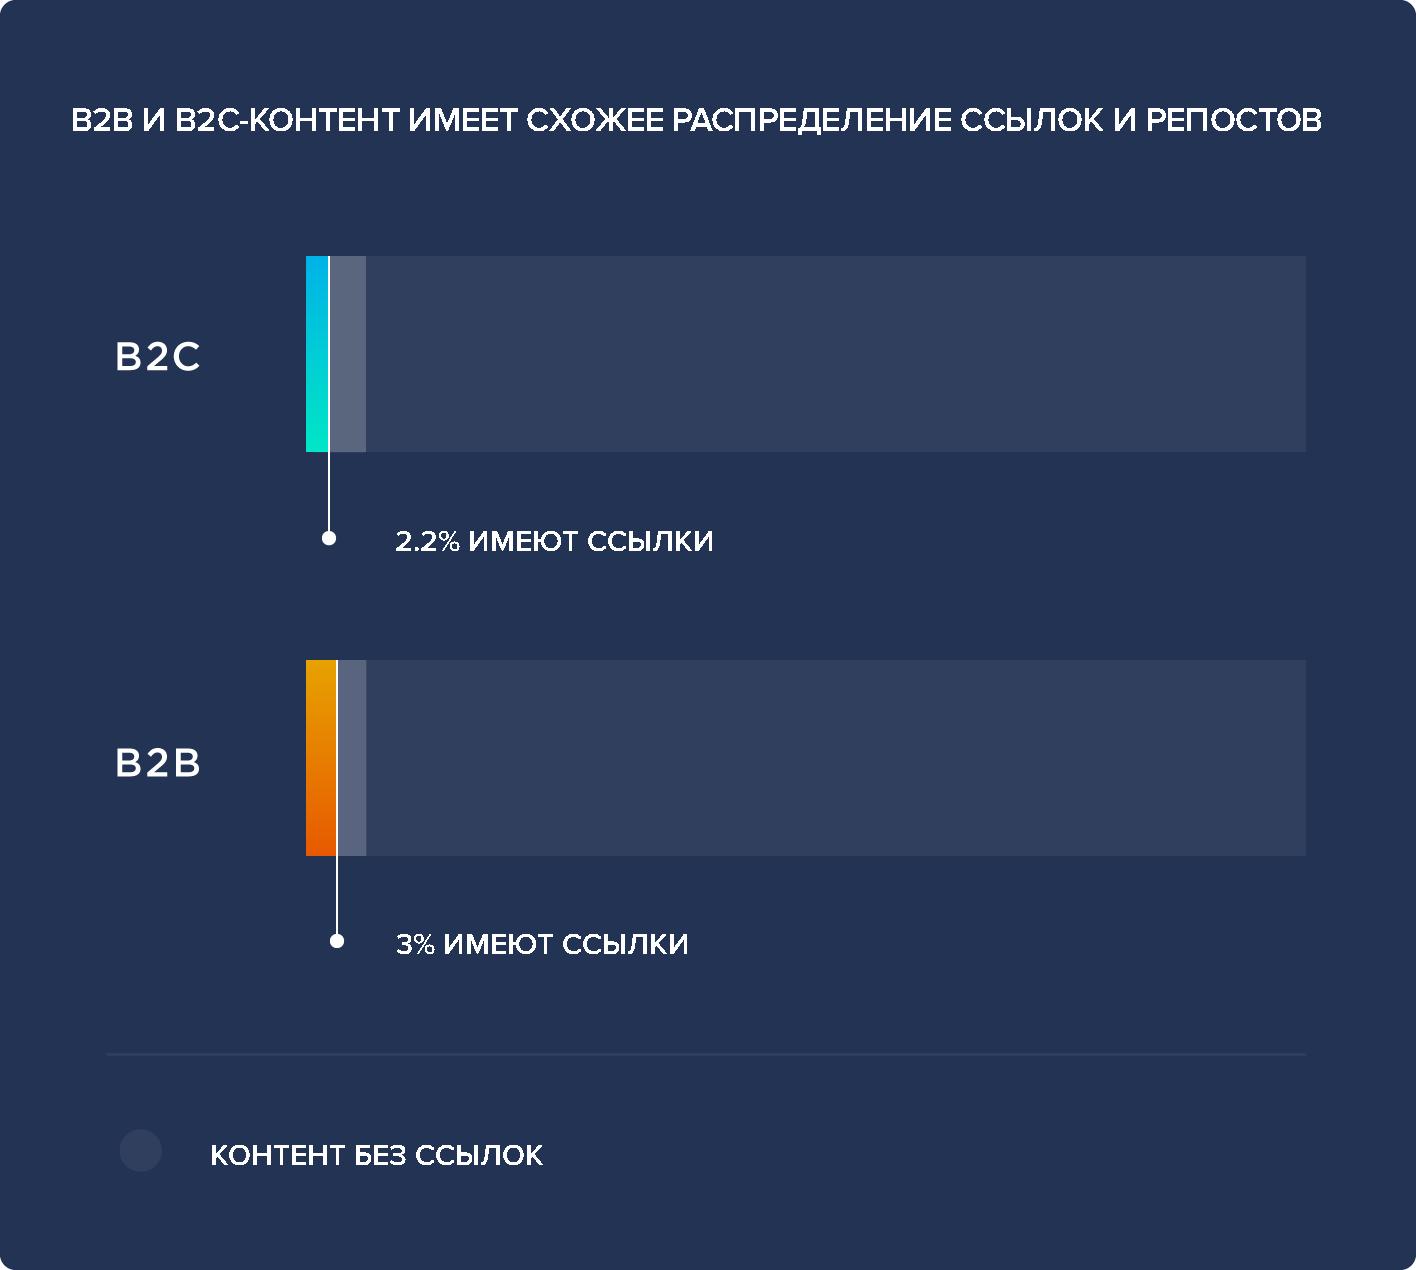 ссылки на контент B2B и B2C